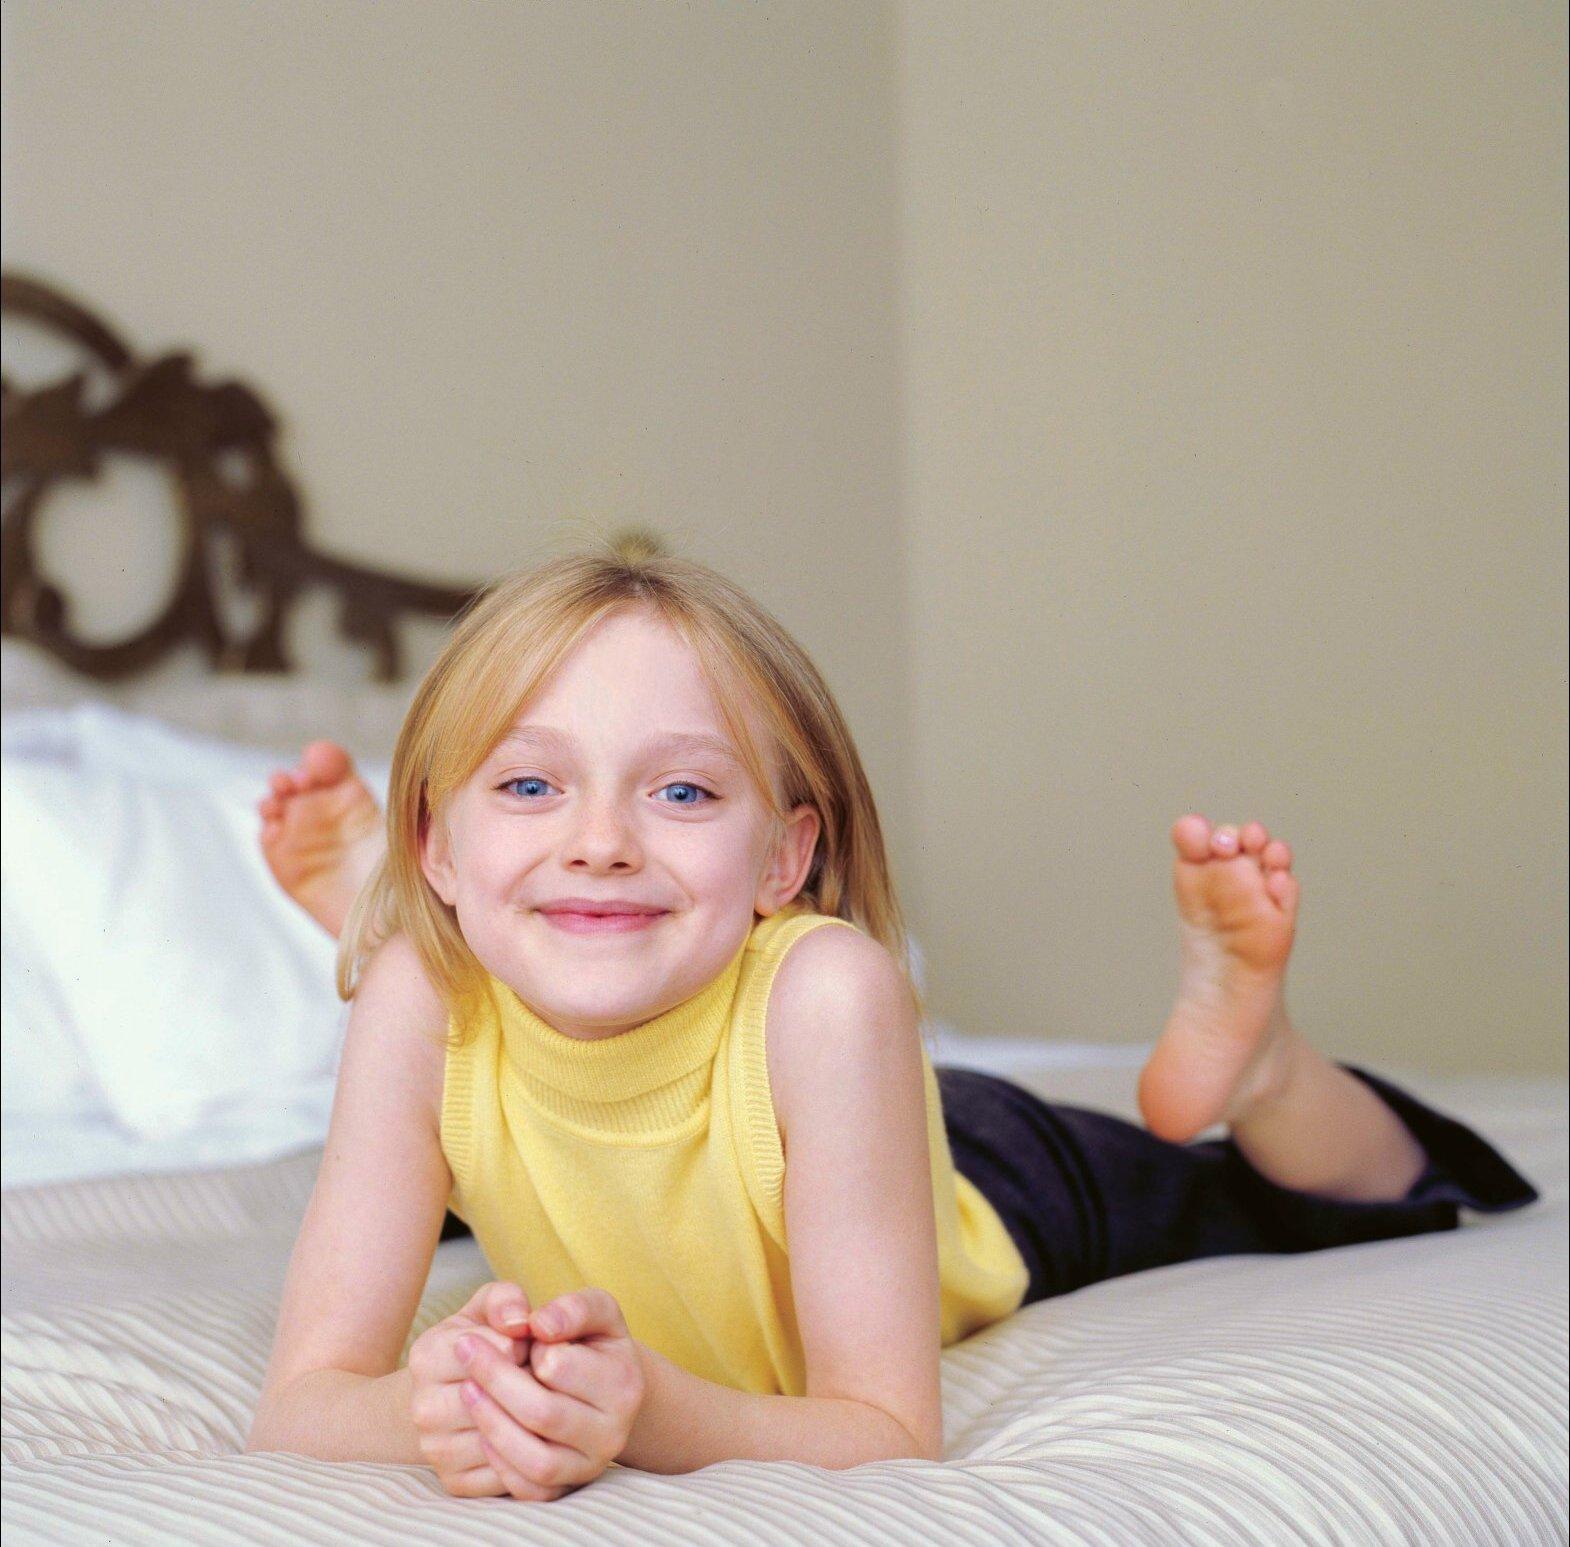 Dakota Fanning childhood photo one at pinterest.com